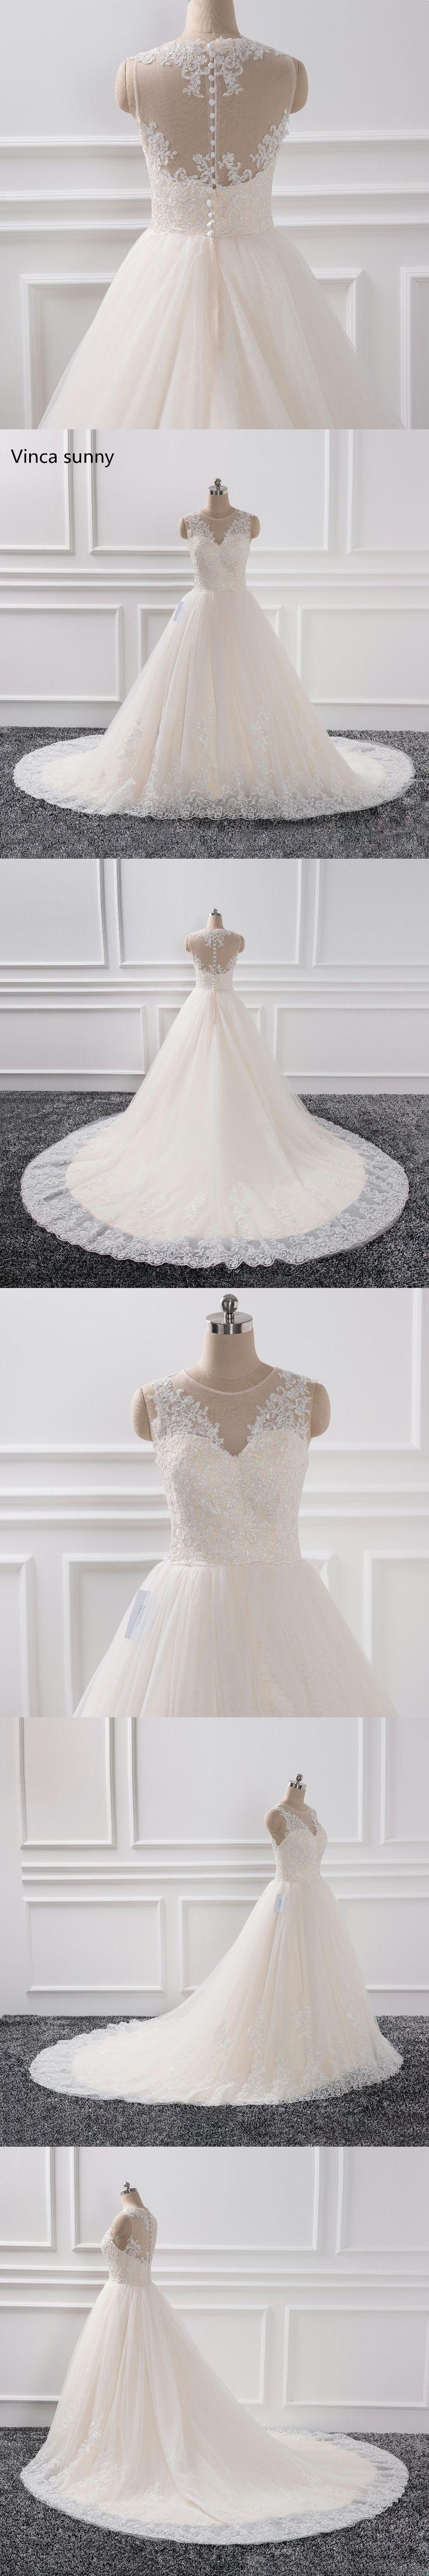 robe de soiree 2018 romantic Lace Sleeveless champagne Ball Gown Wedding Dresses Appliques Bridal Gowns vestido de noiva